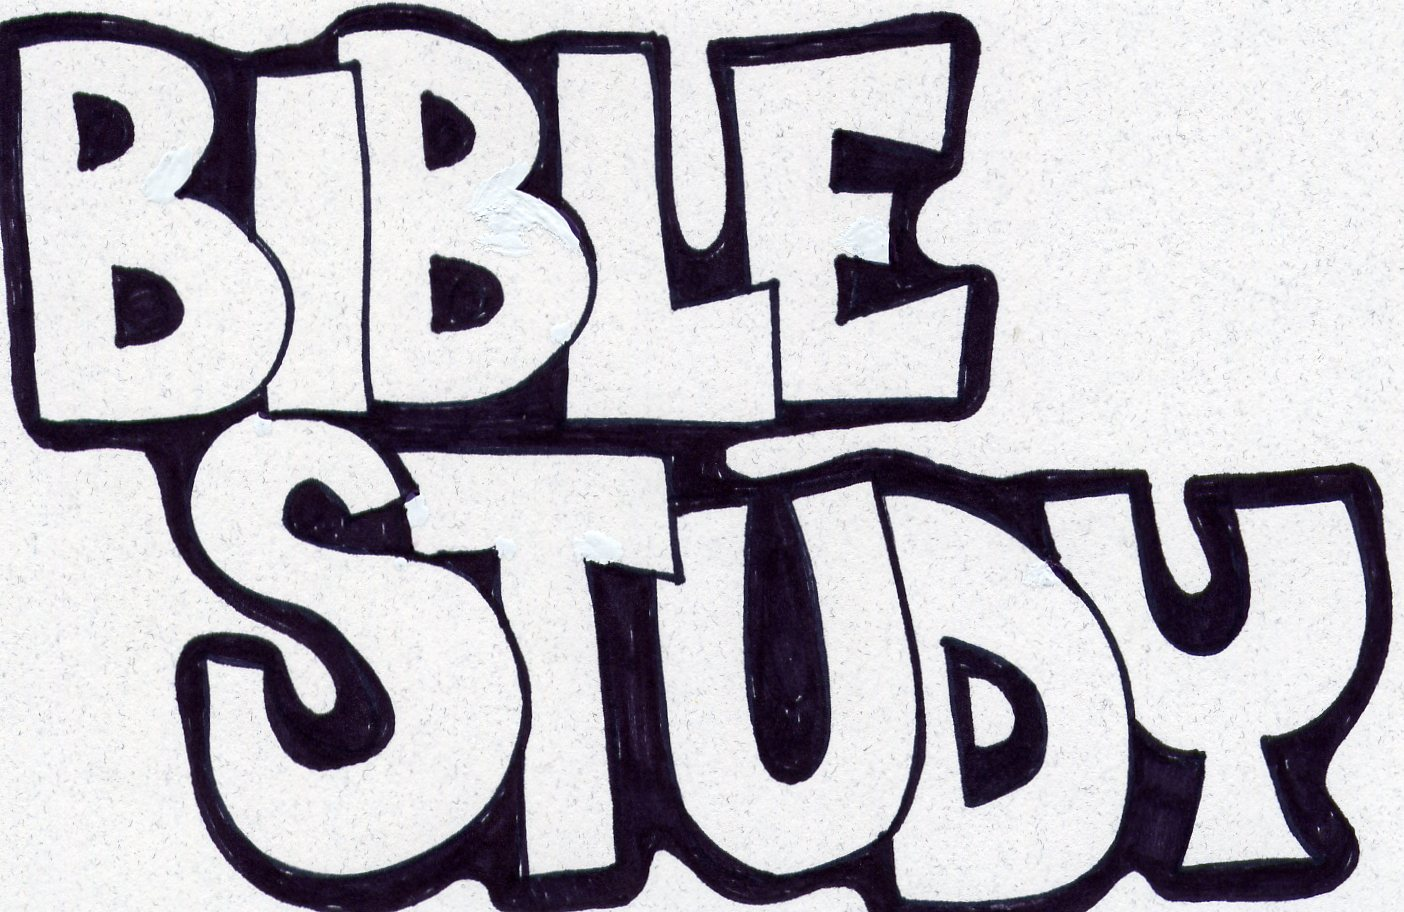 The Wesley Study Bible - Wikipedia